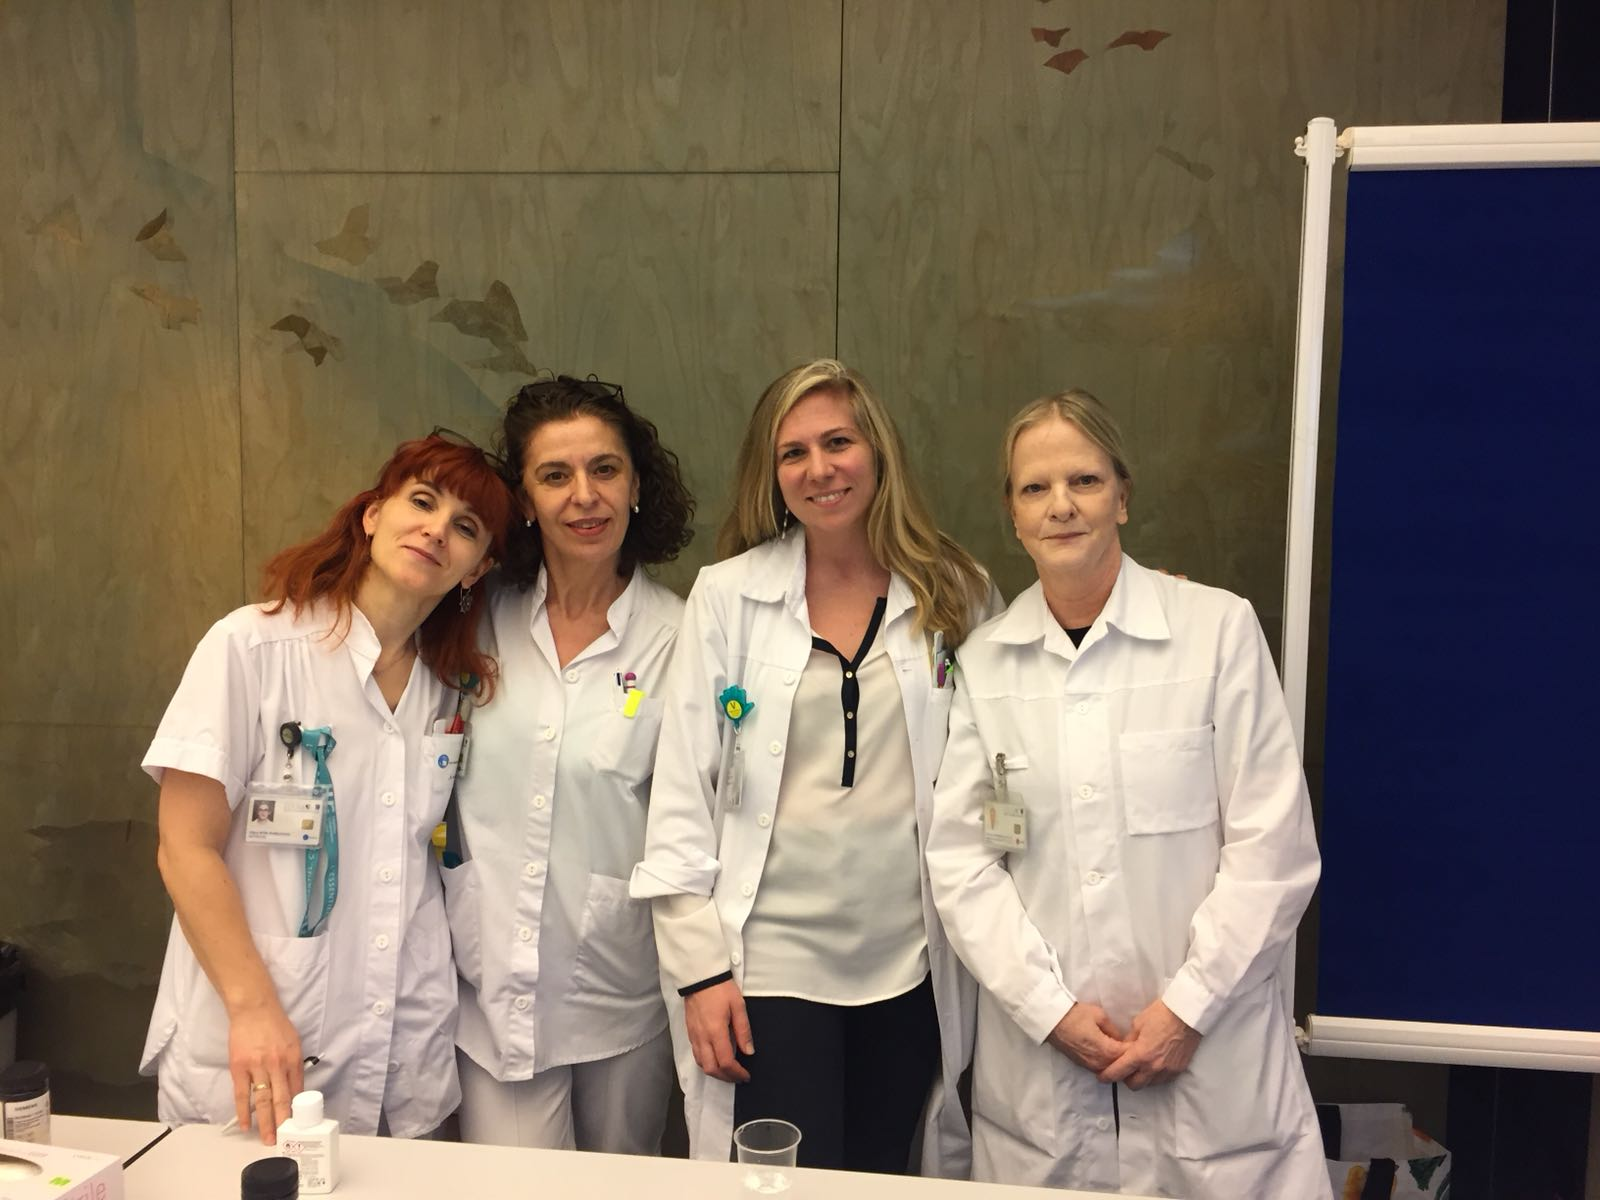 équipe médico-soignante de néphrologie